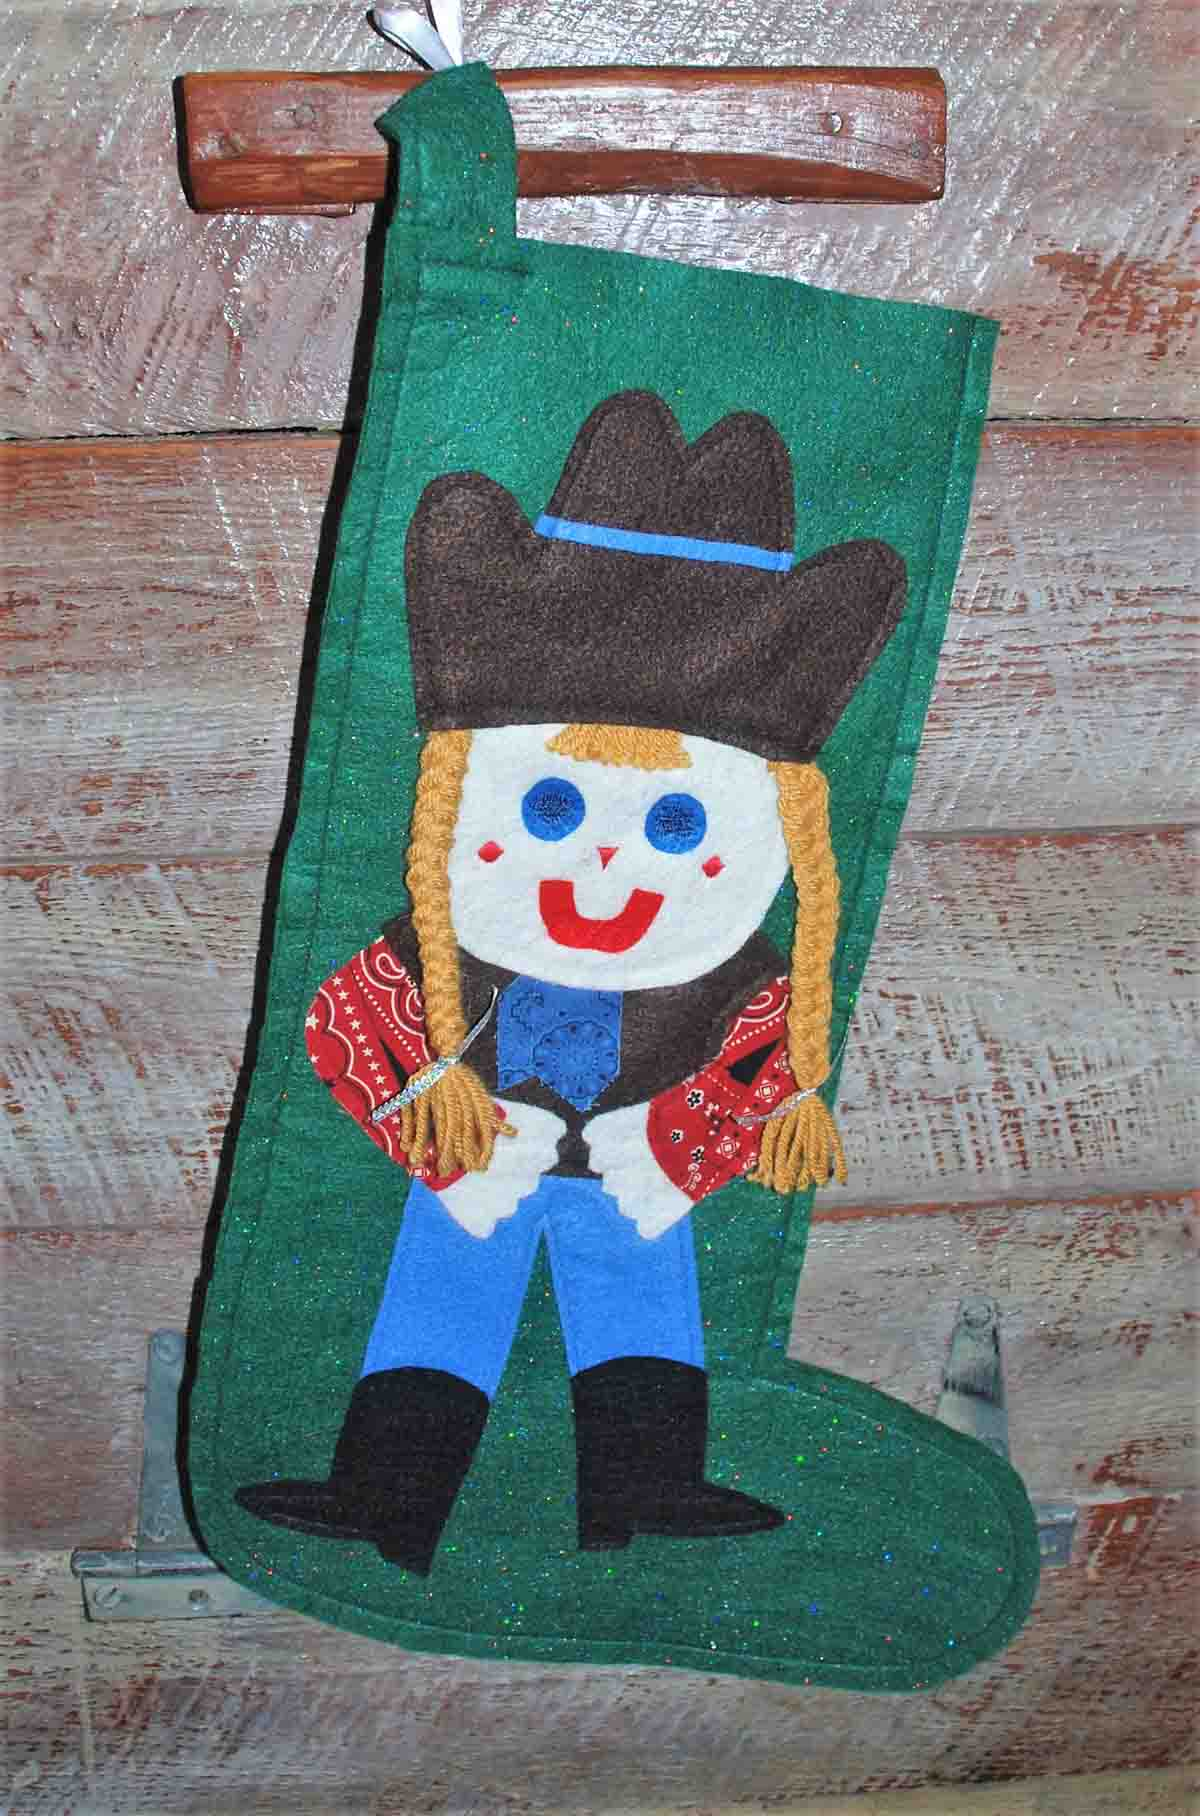 Handmade Felt Cowkid's Stocking